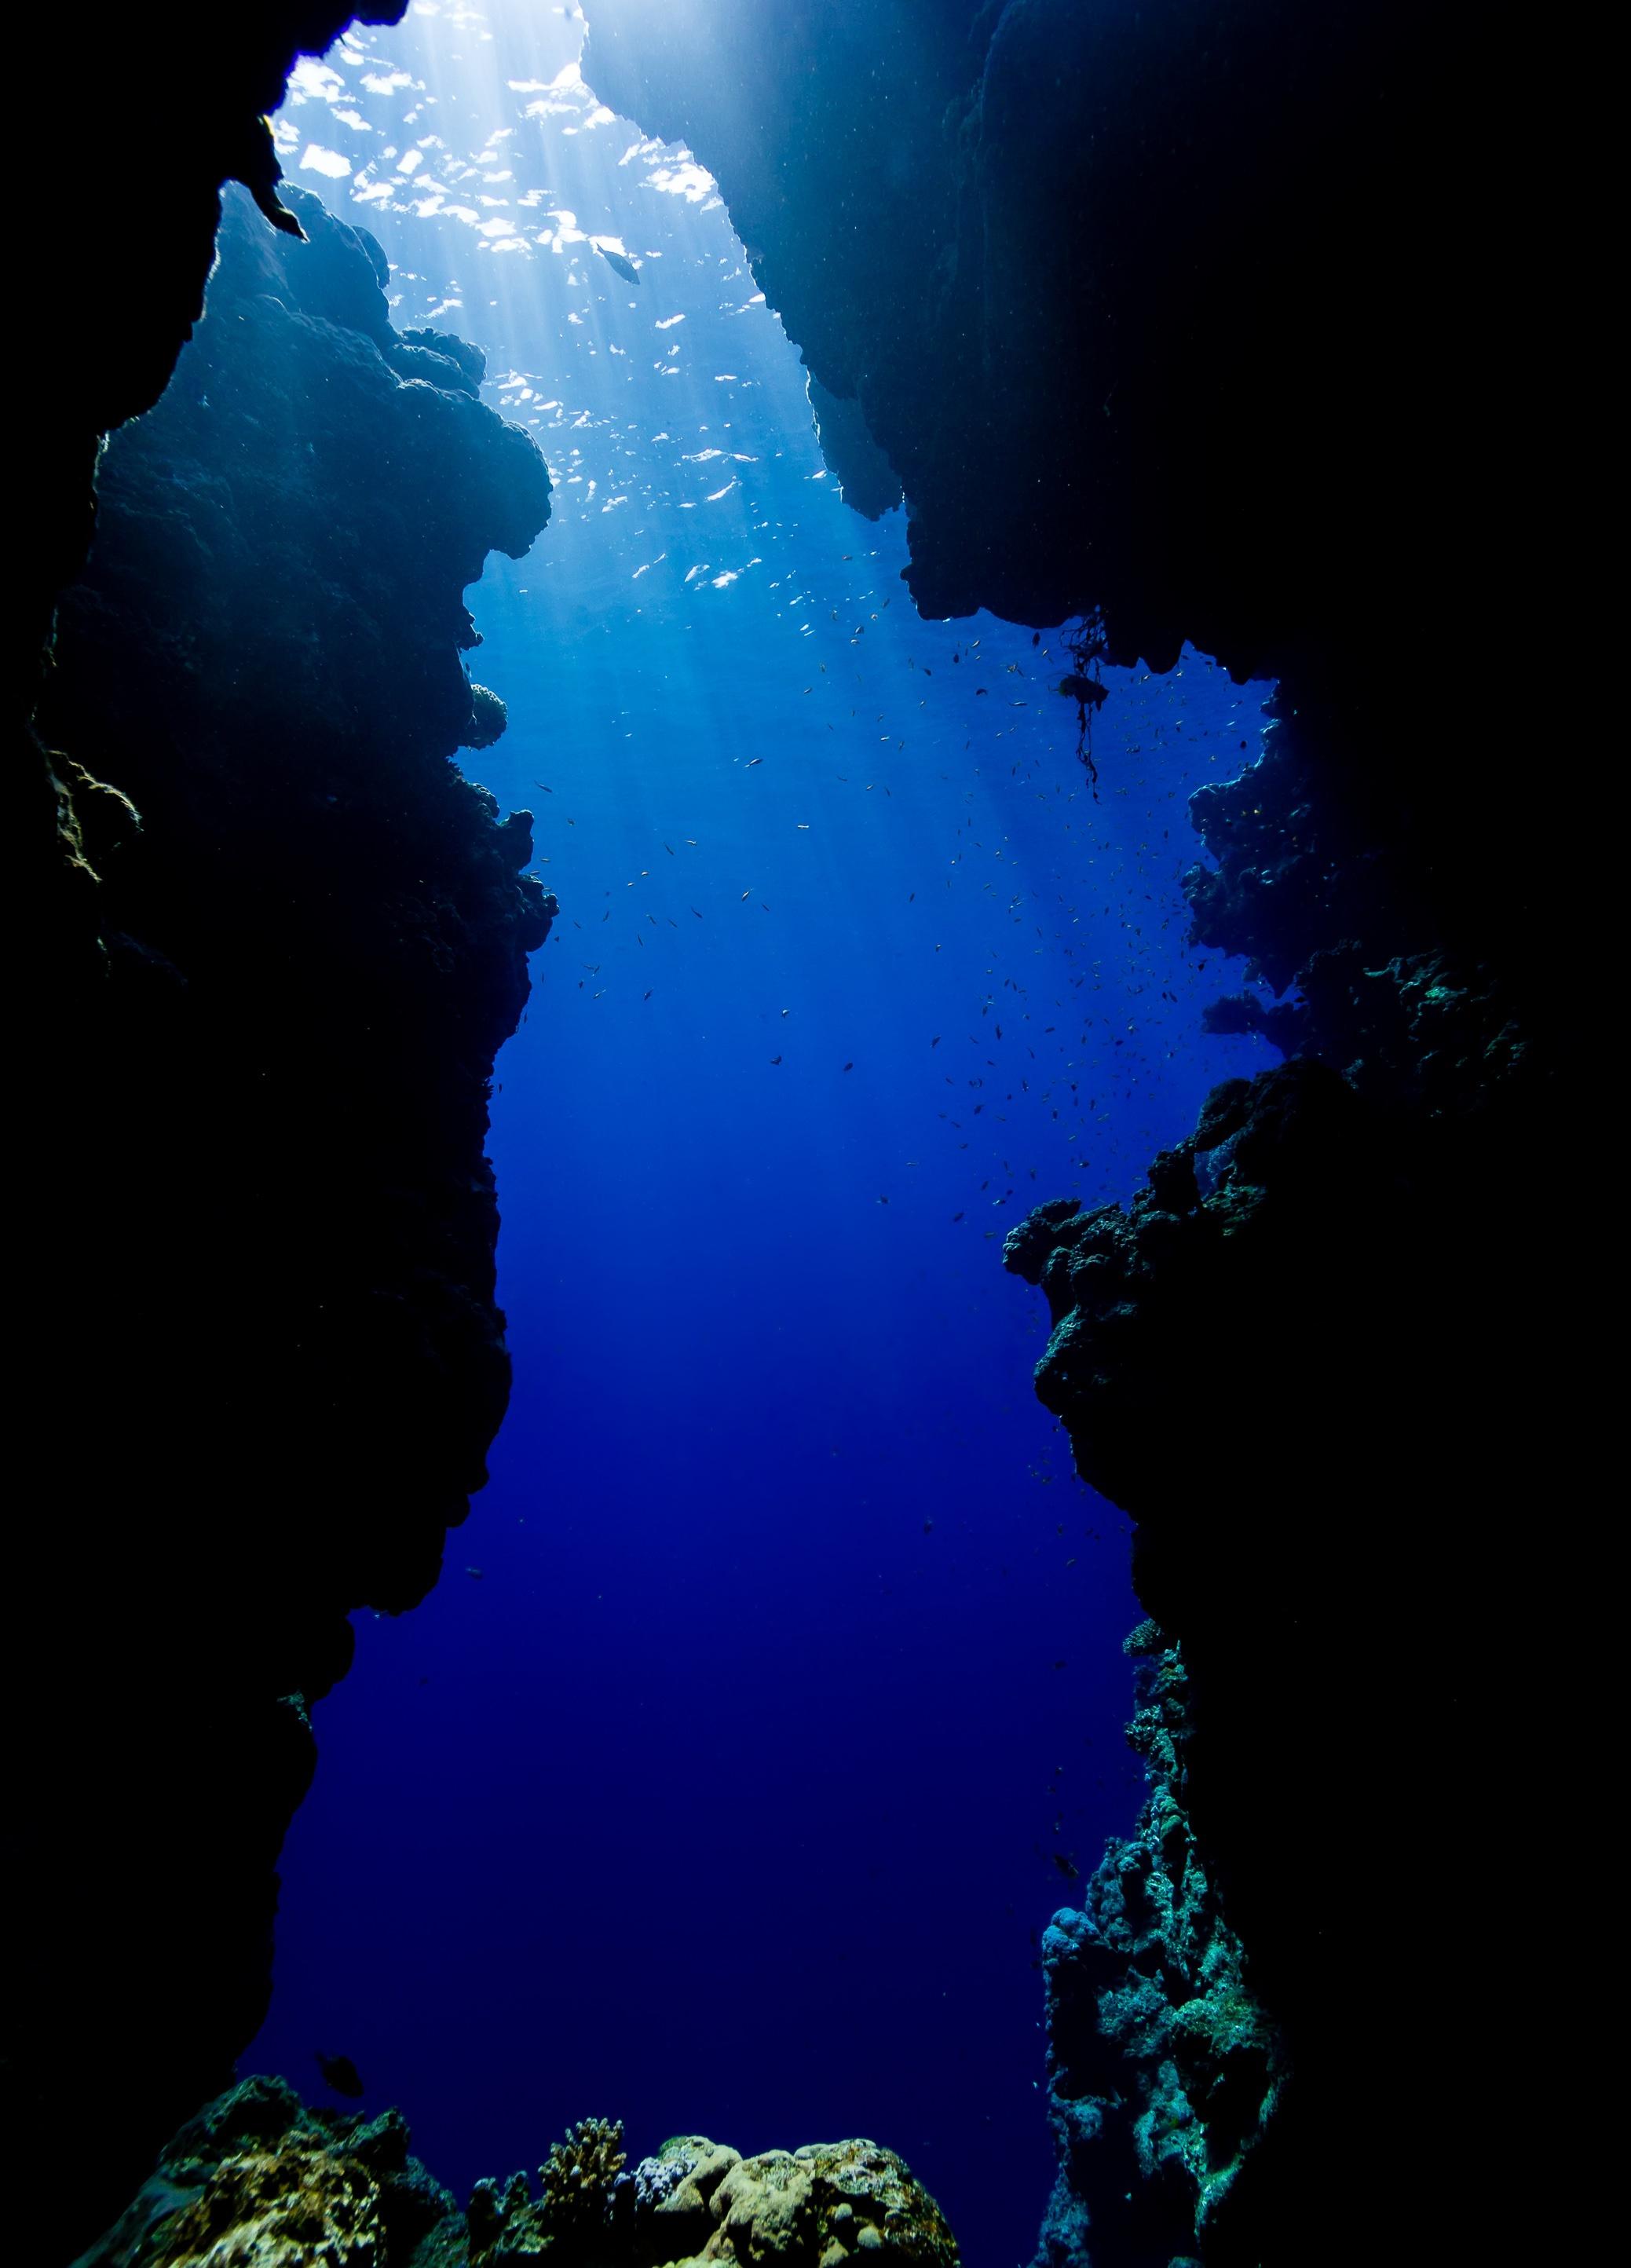 Blue Hole Dahab